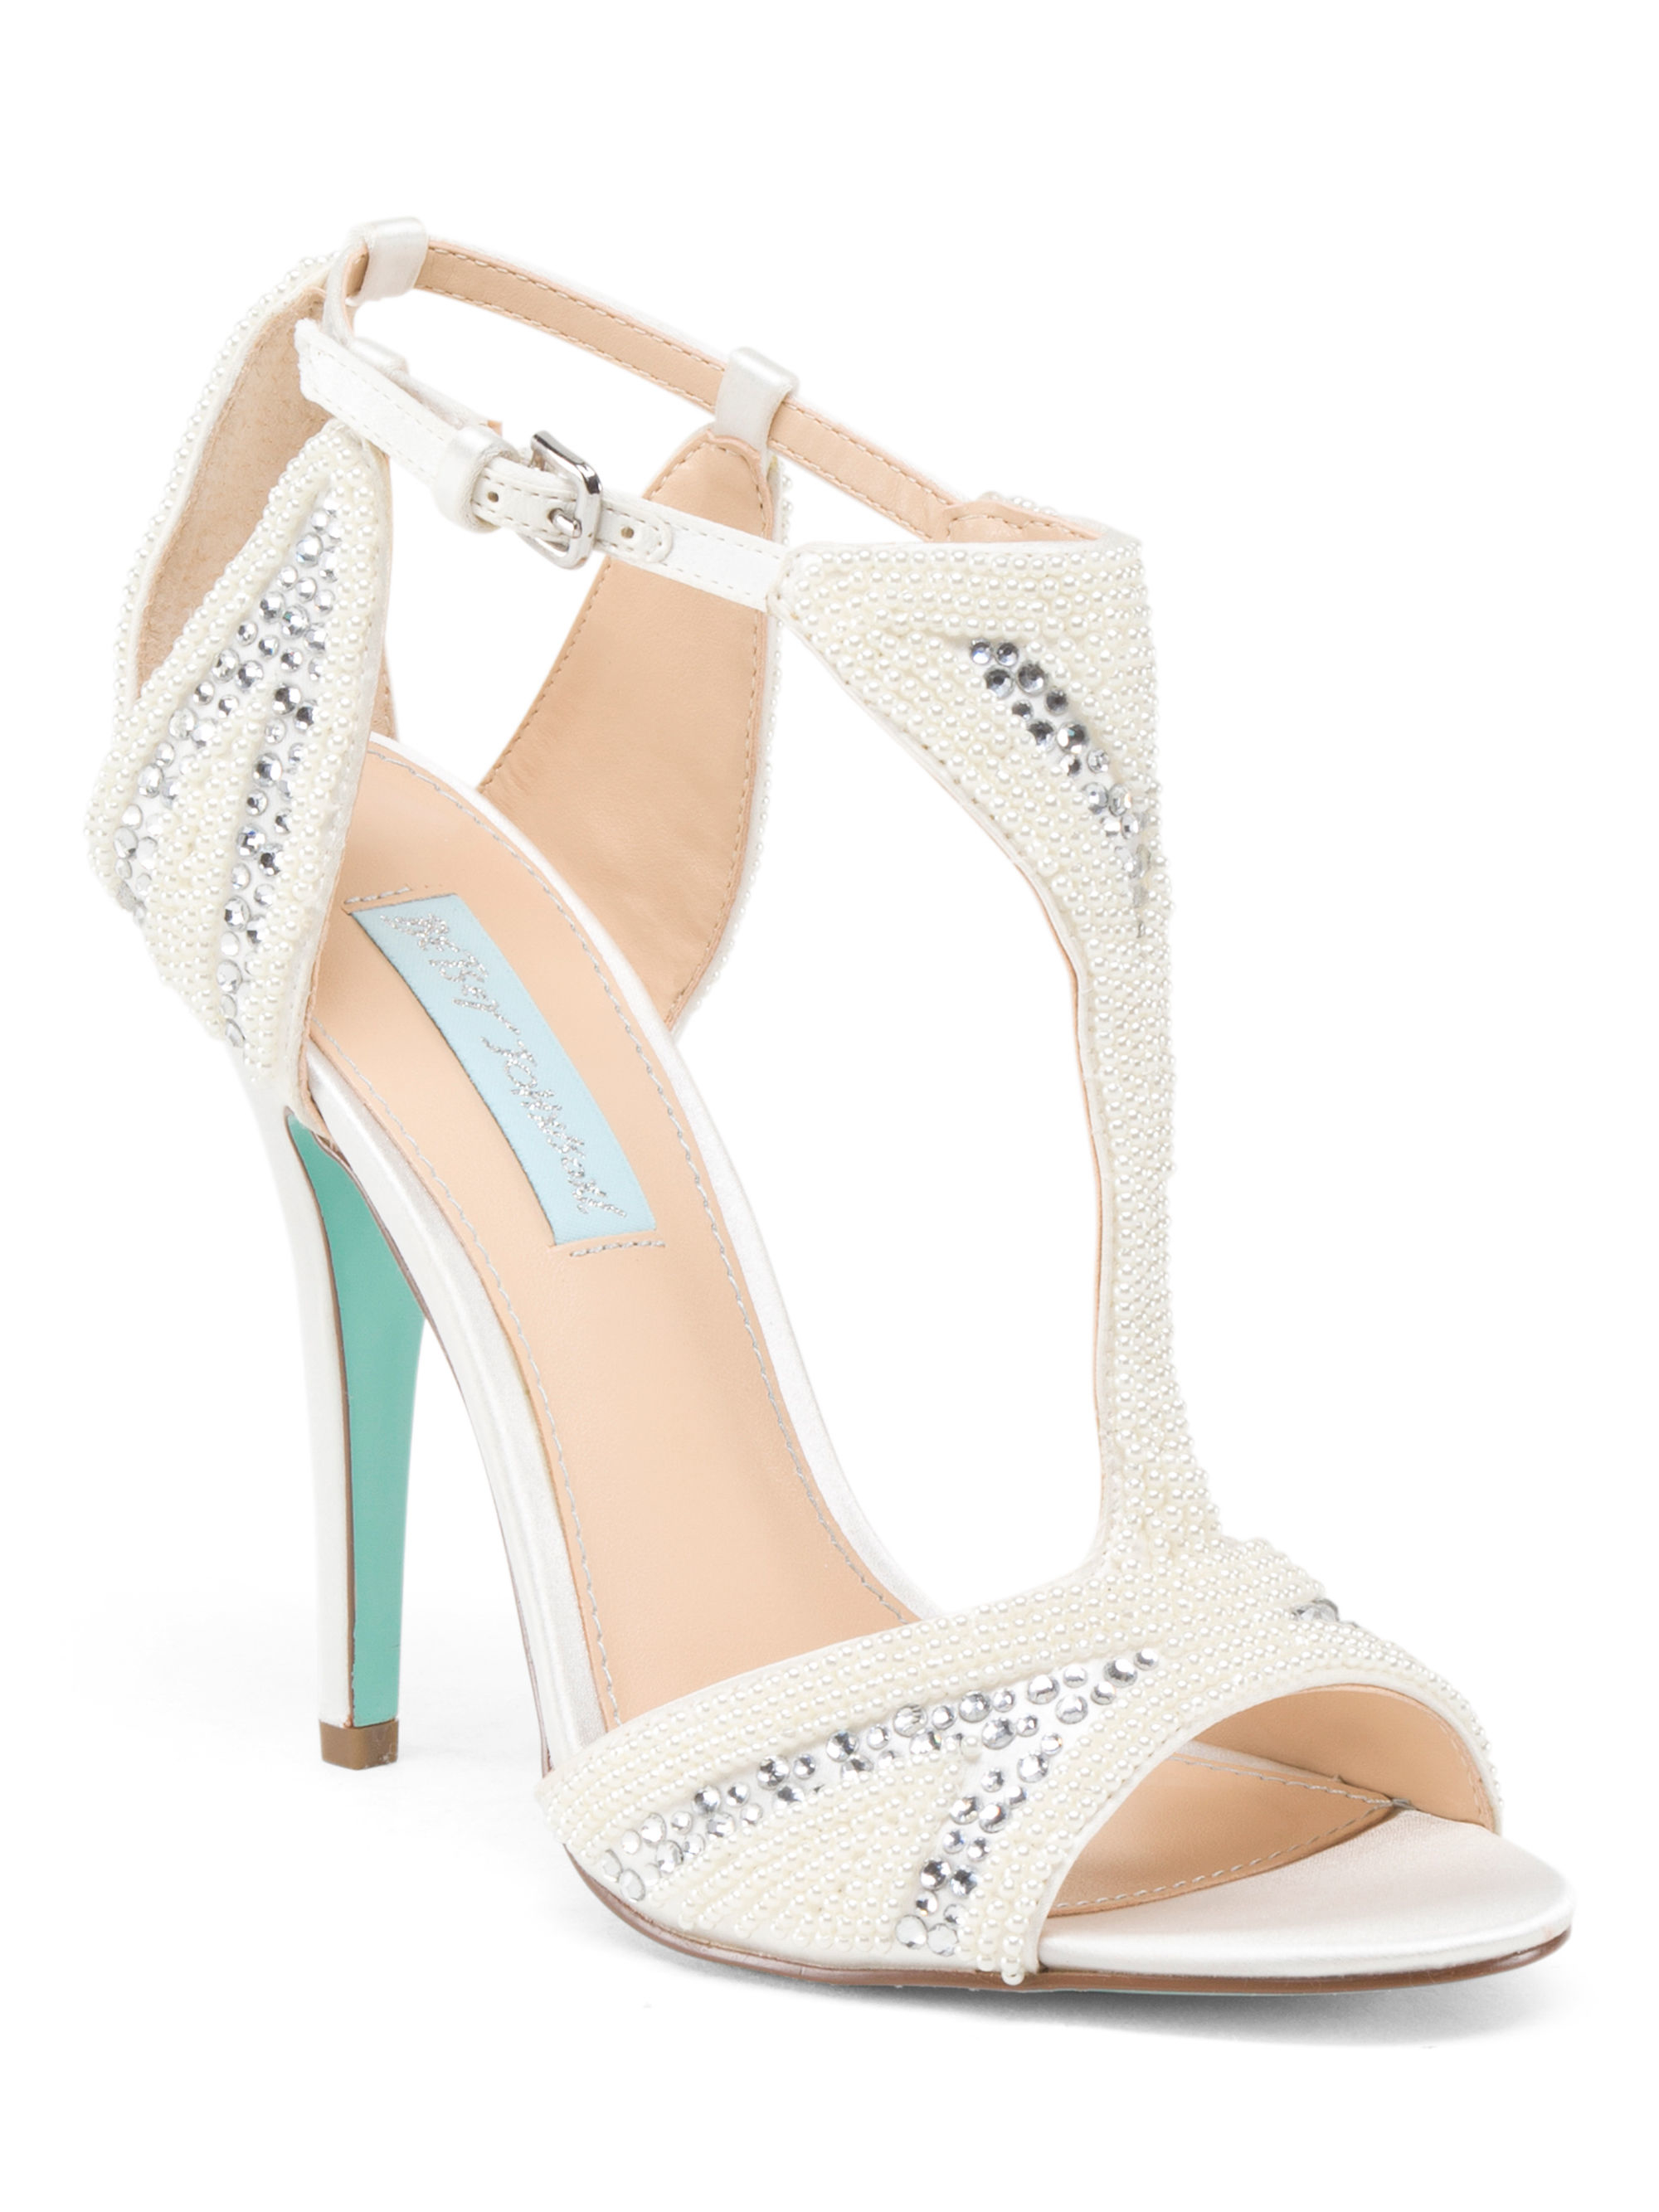 tj maxx ido dress ankle heel in white lyst